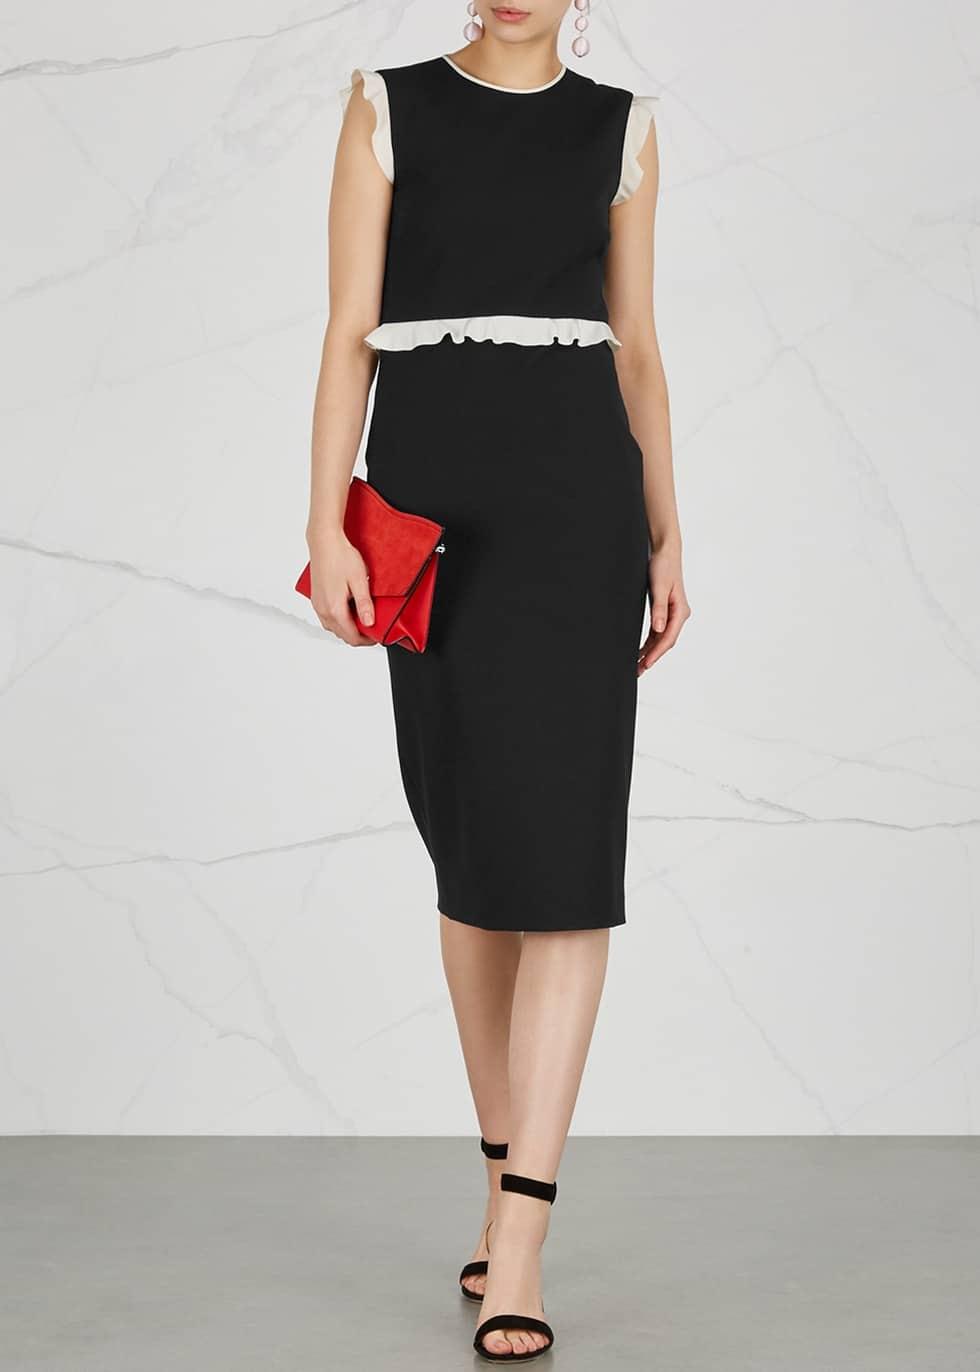 25e2e45932c RED VALENTINO Ruffle Trimmed Black Dress - We Select Dresses